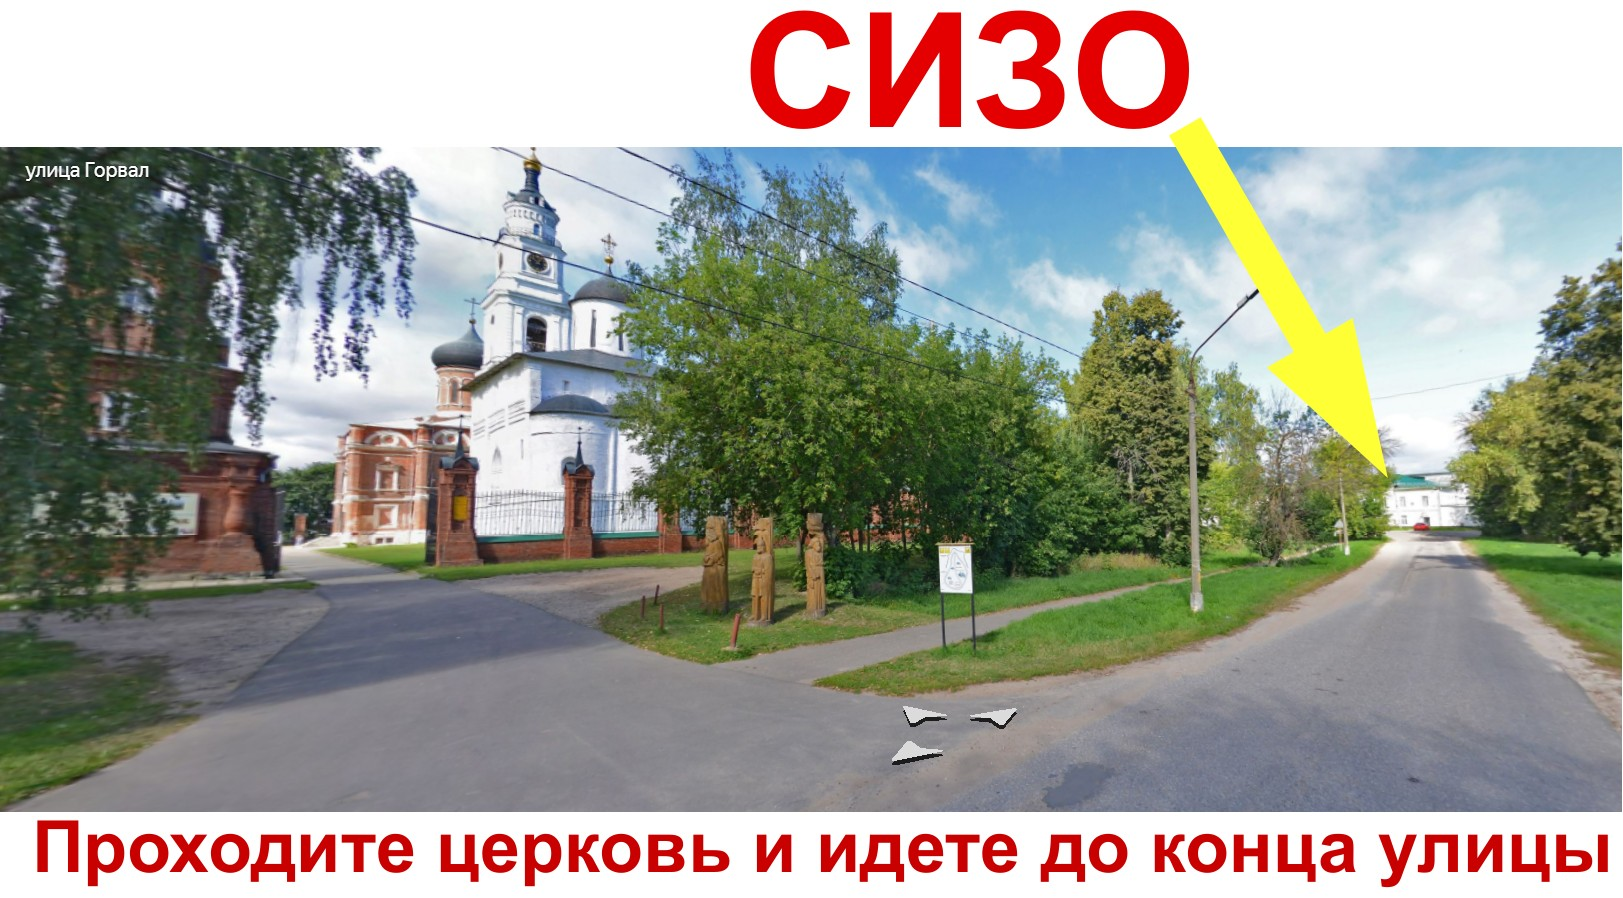 Адрес СИЗО Волоколамск